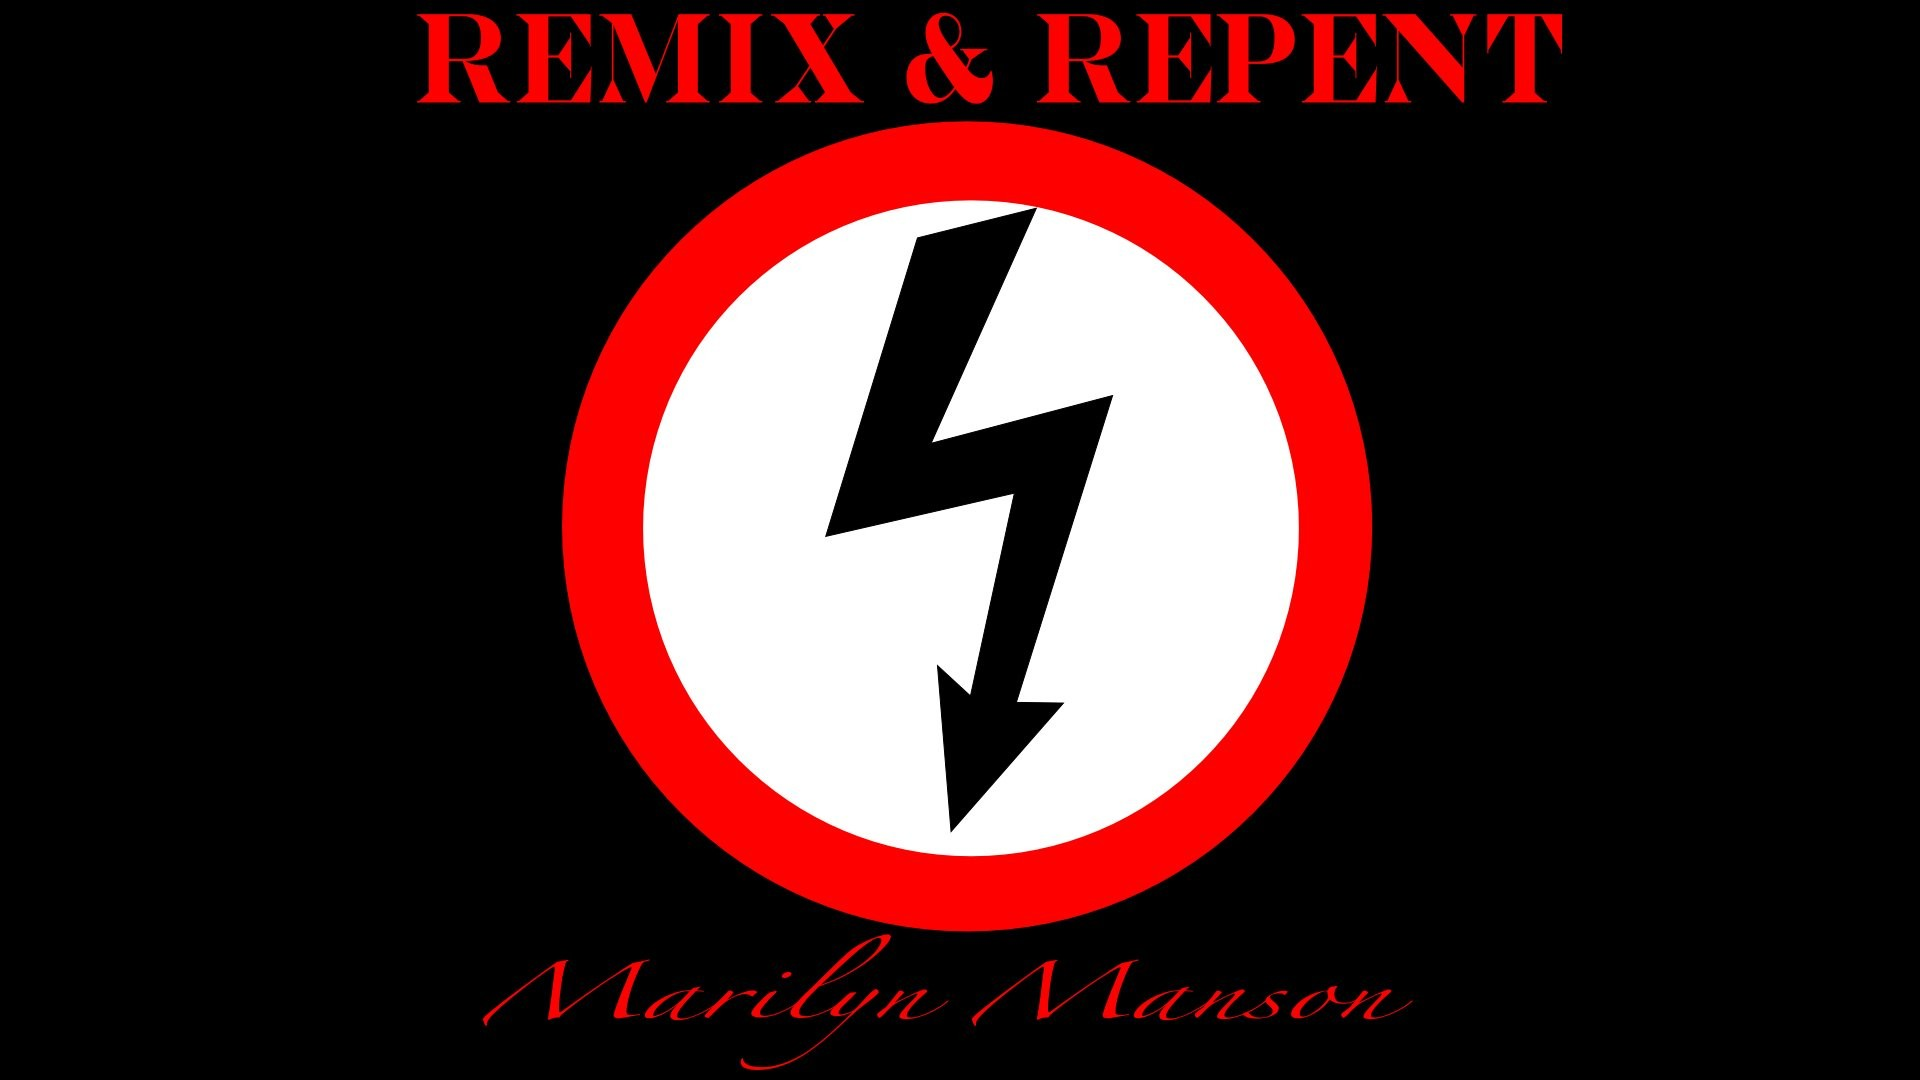 Music – Marilyn Manson Industrial Metal Heavy Metal Wallpaper